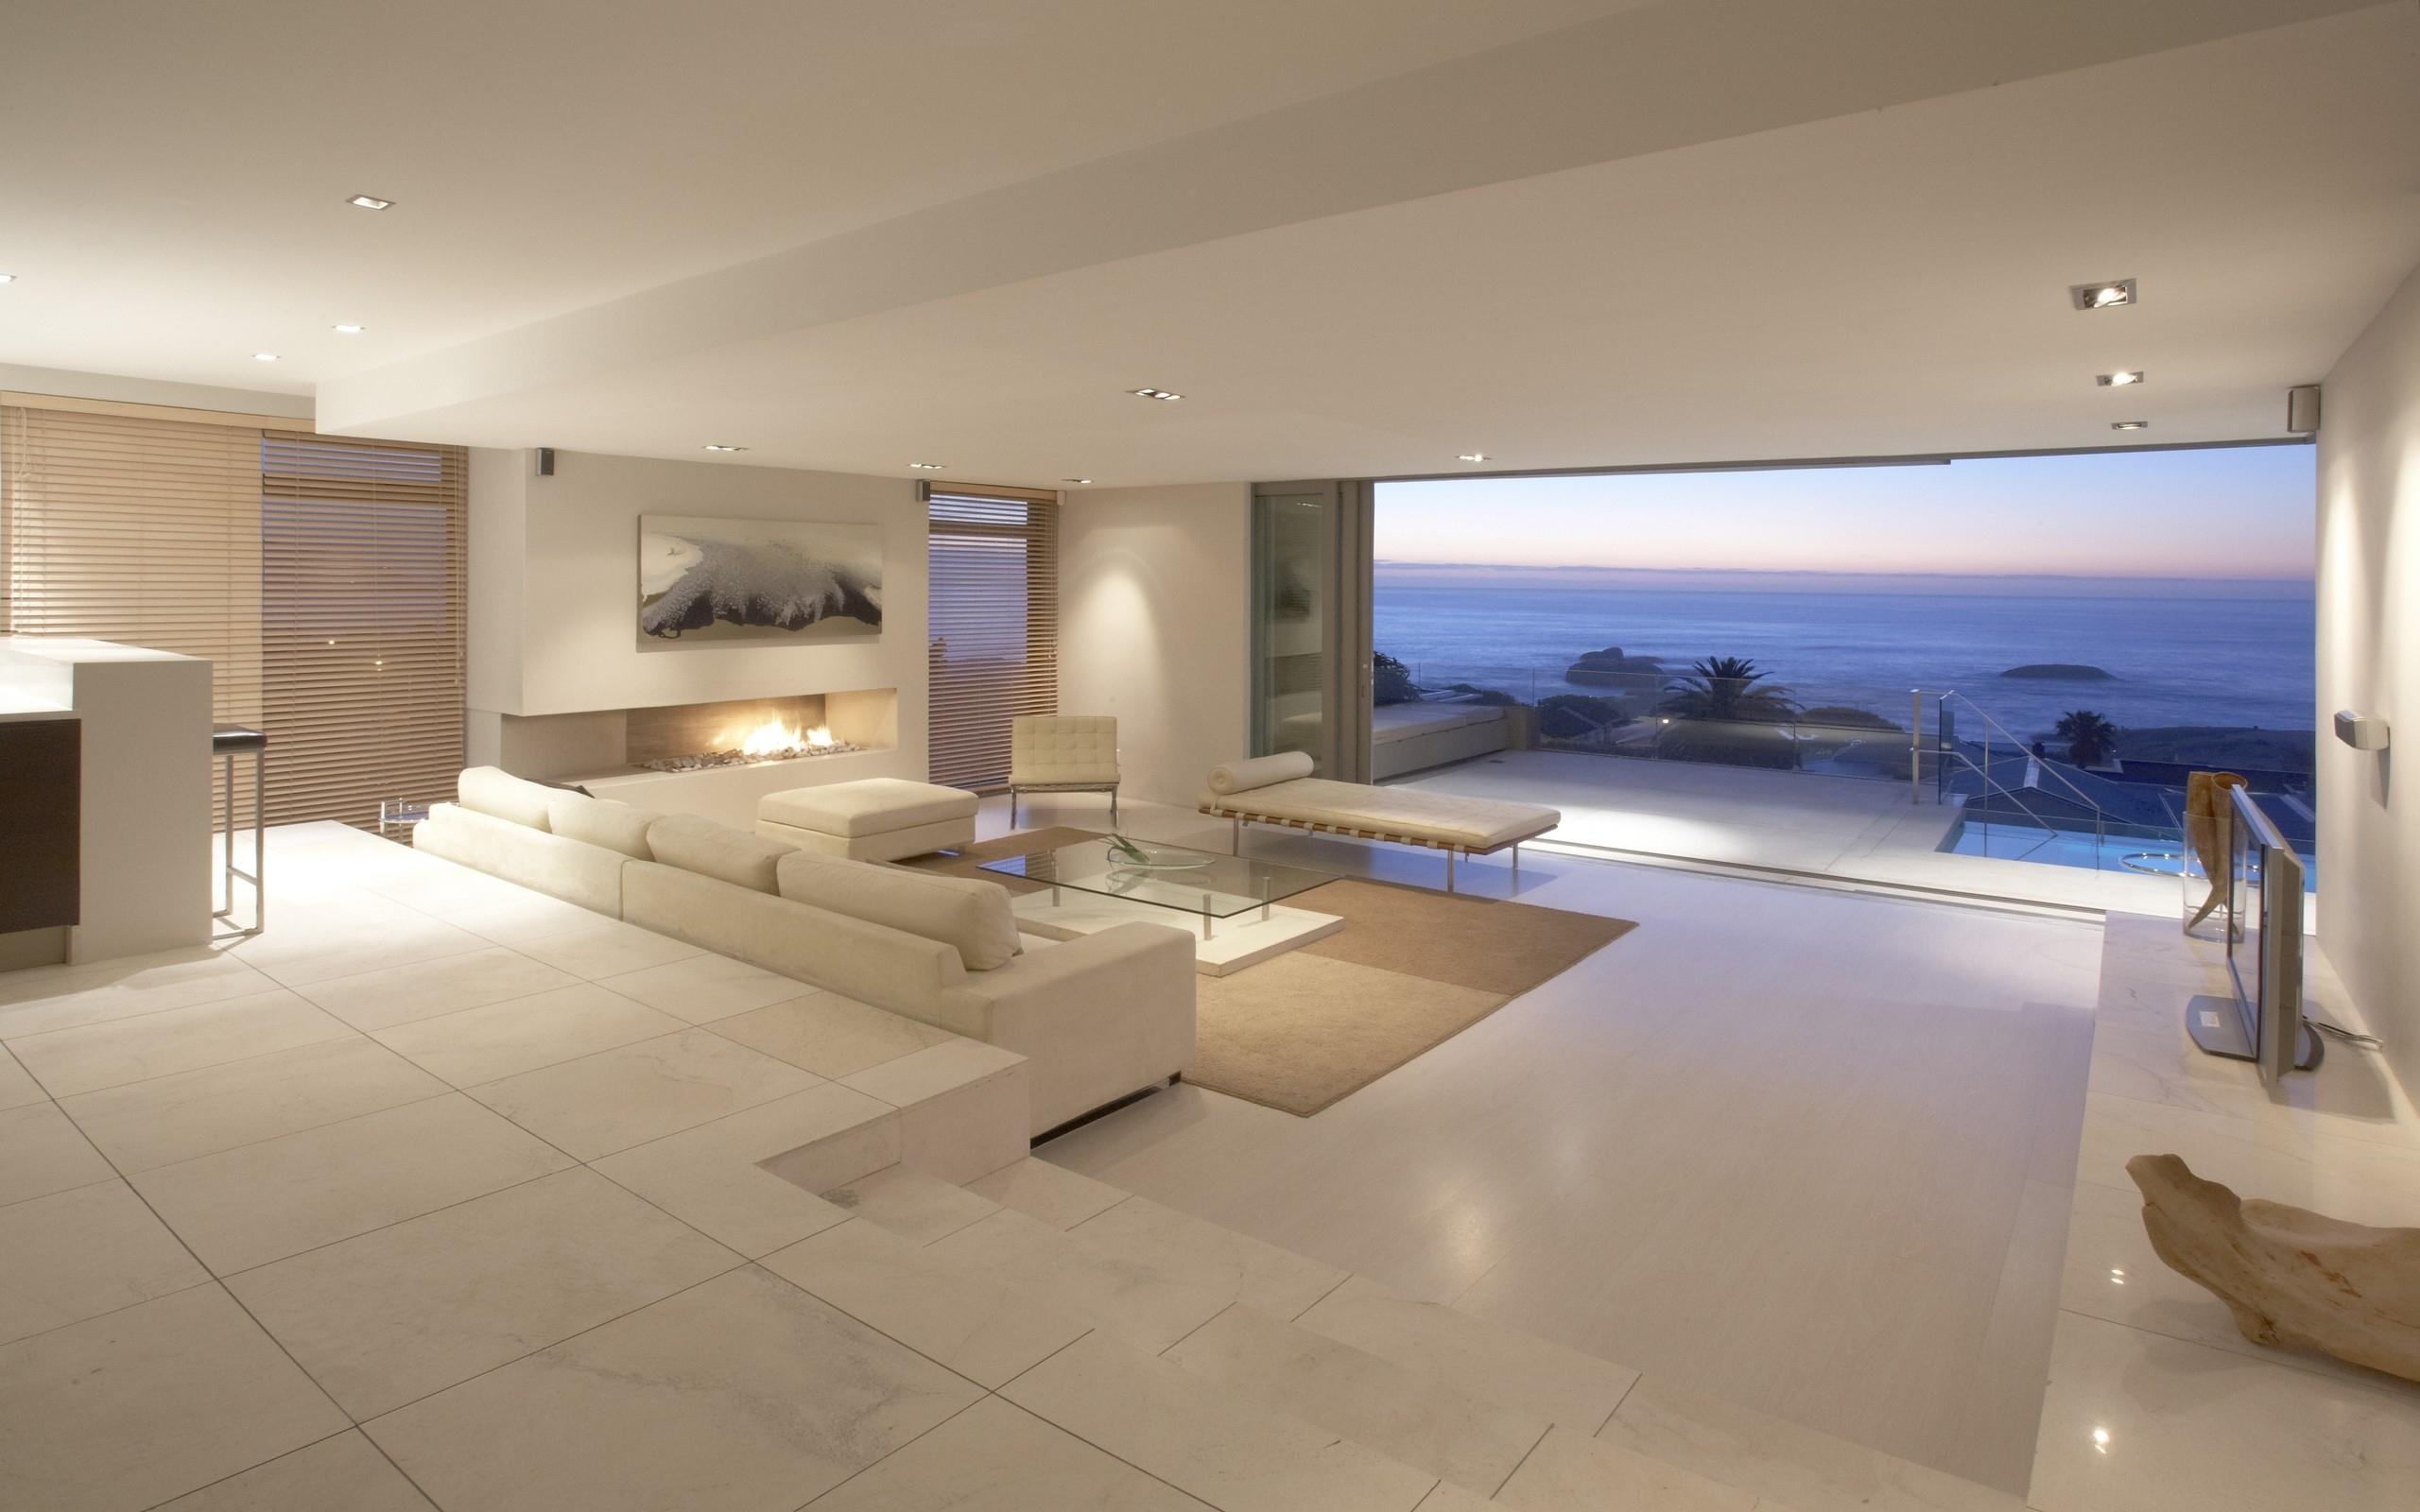 architecture_room_interior_living_room_interior_designs_2560x1600_wallpaper_Wall